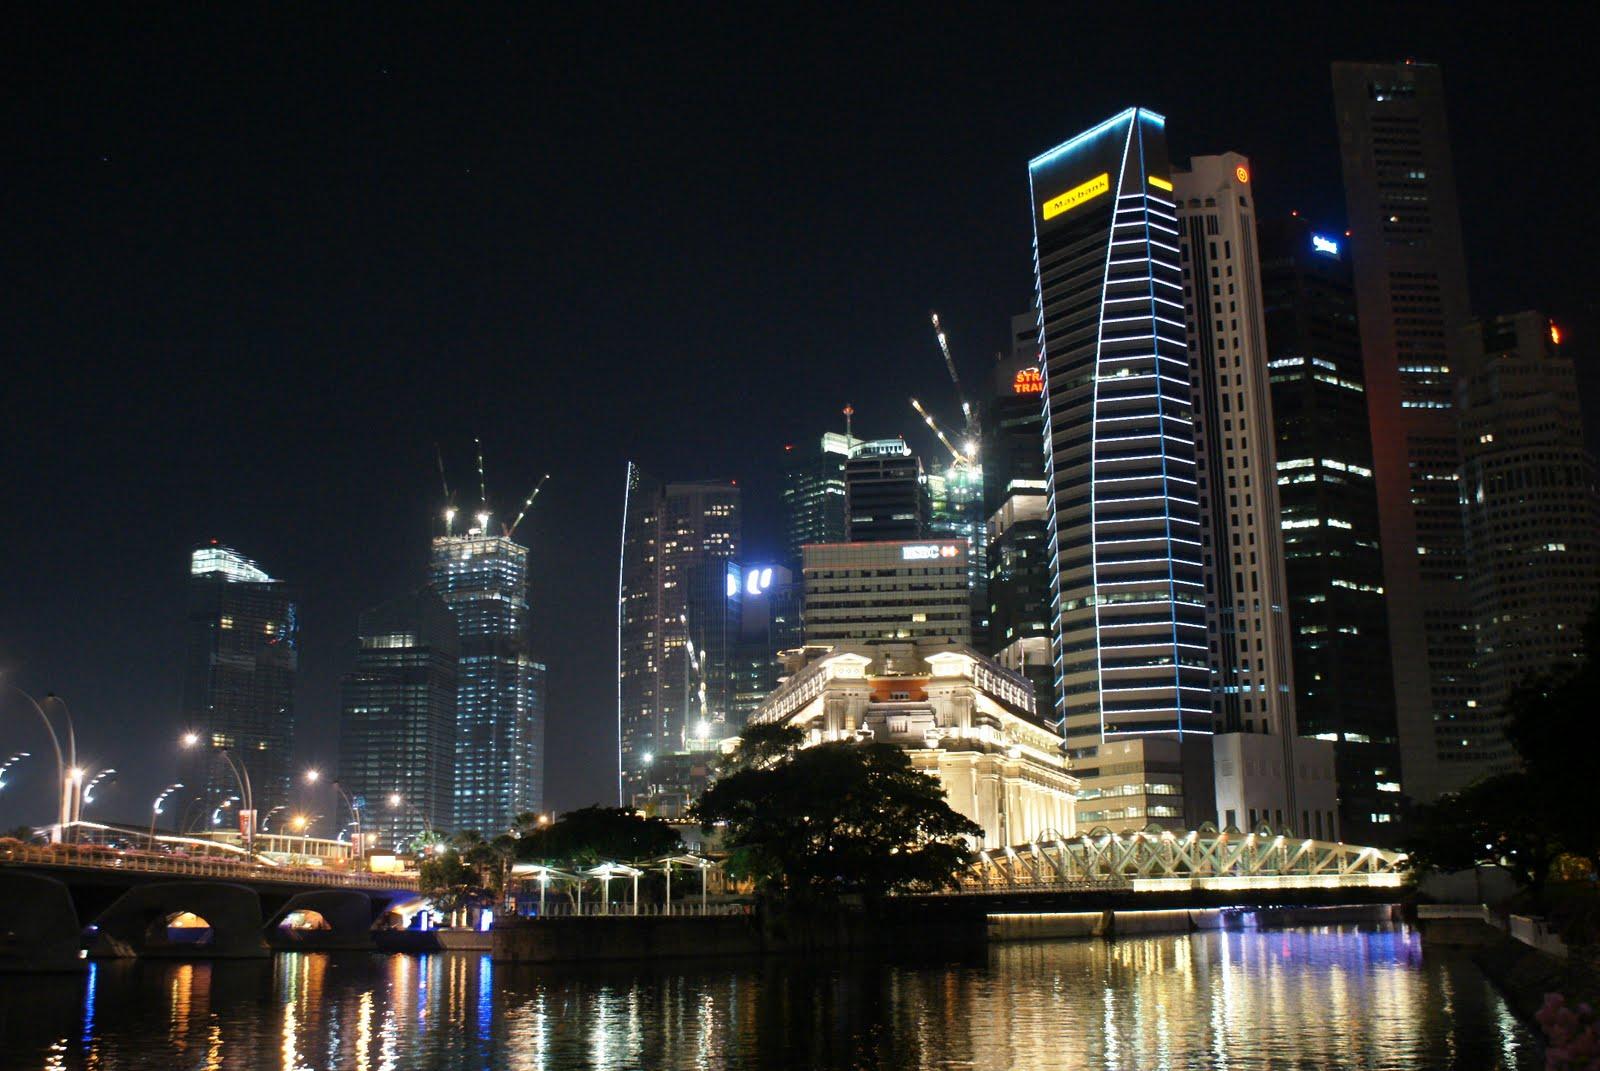 beginners in asia c 39 est beau une ville la nuit. Black Bedroom Furniture Sets. Home Design Ideas